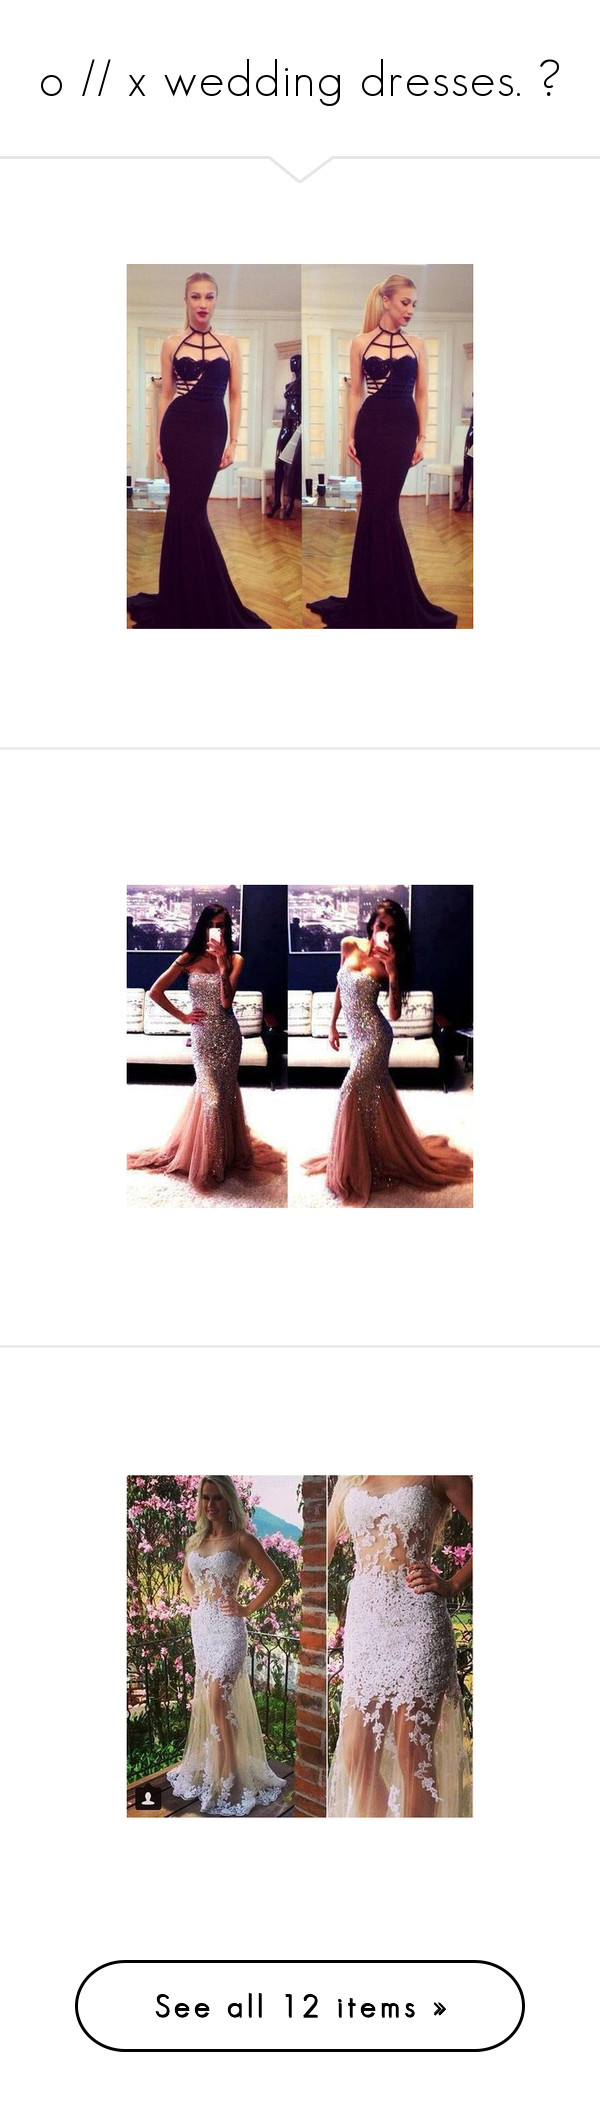 O x wedding dresses